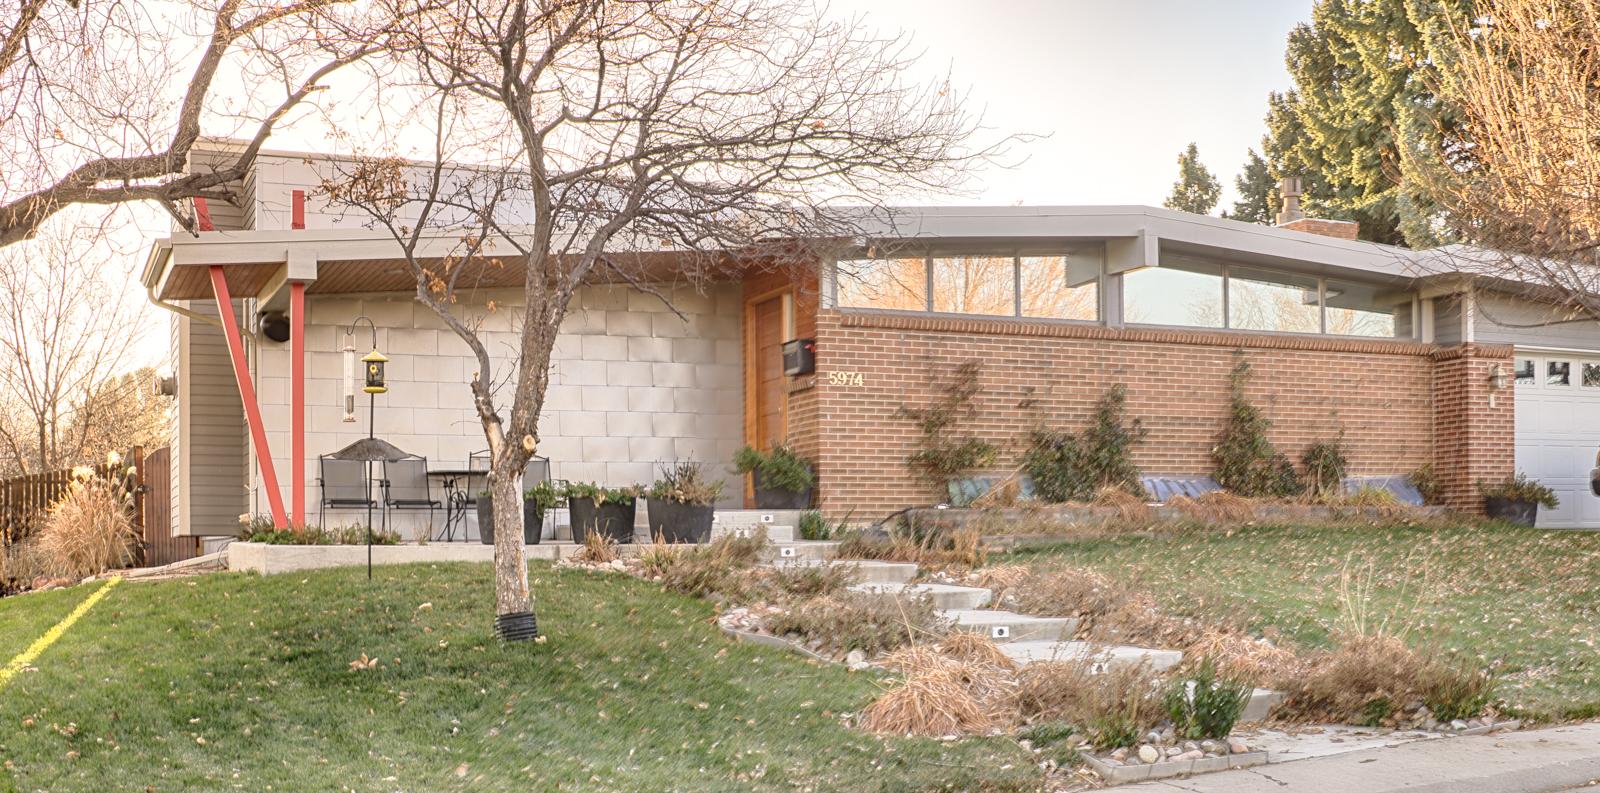 Adrian-Kinney-Dream-House-Acres-3.jpg